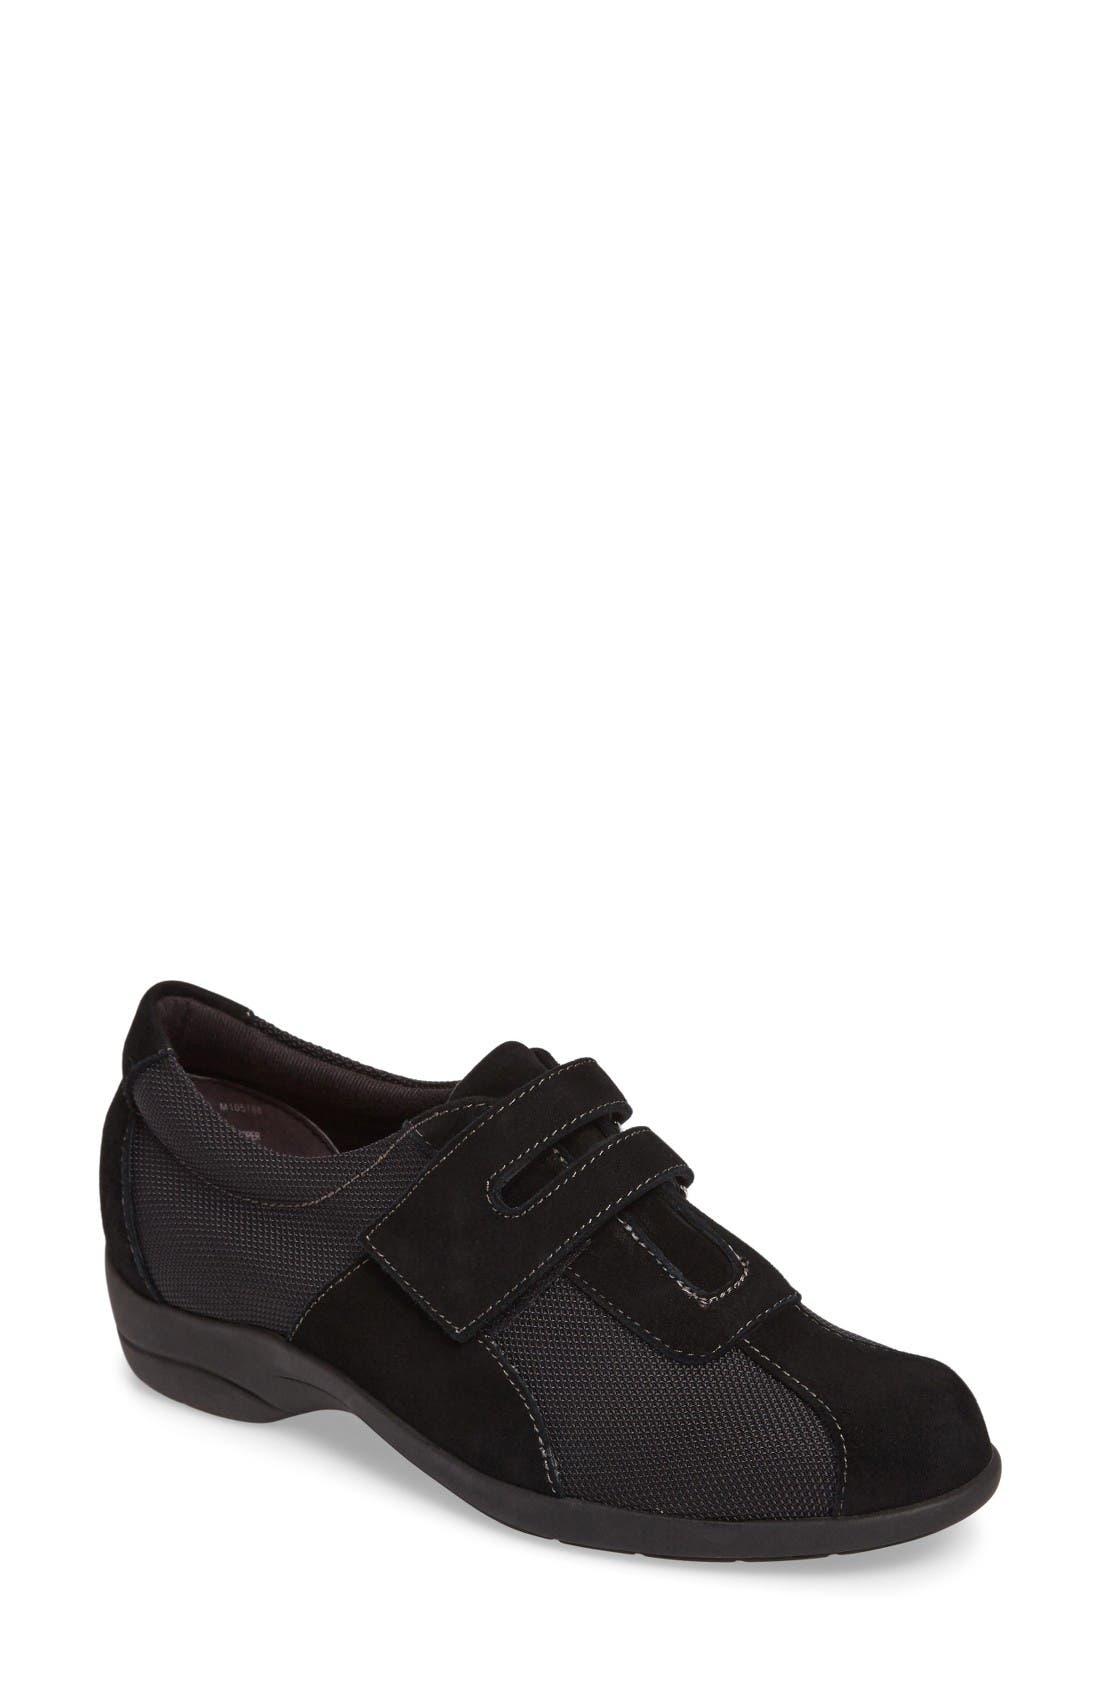 Alternate Image 1 Selected - Munro Joliet Sneaker (Women)